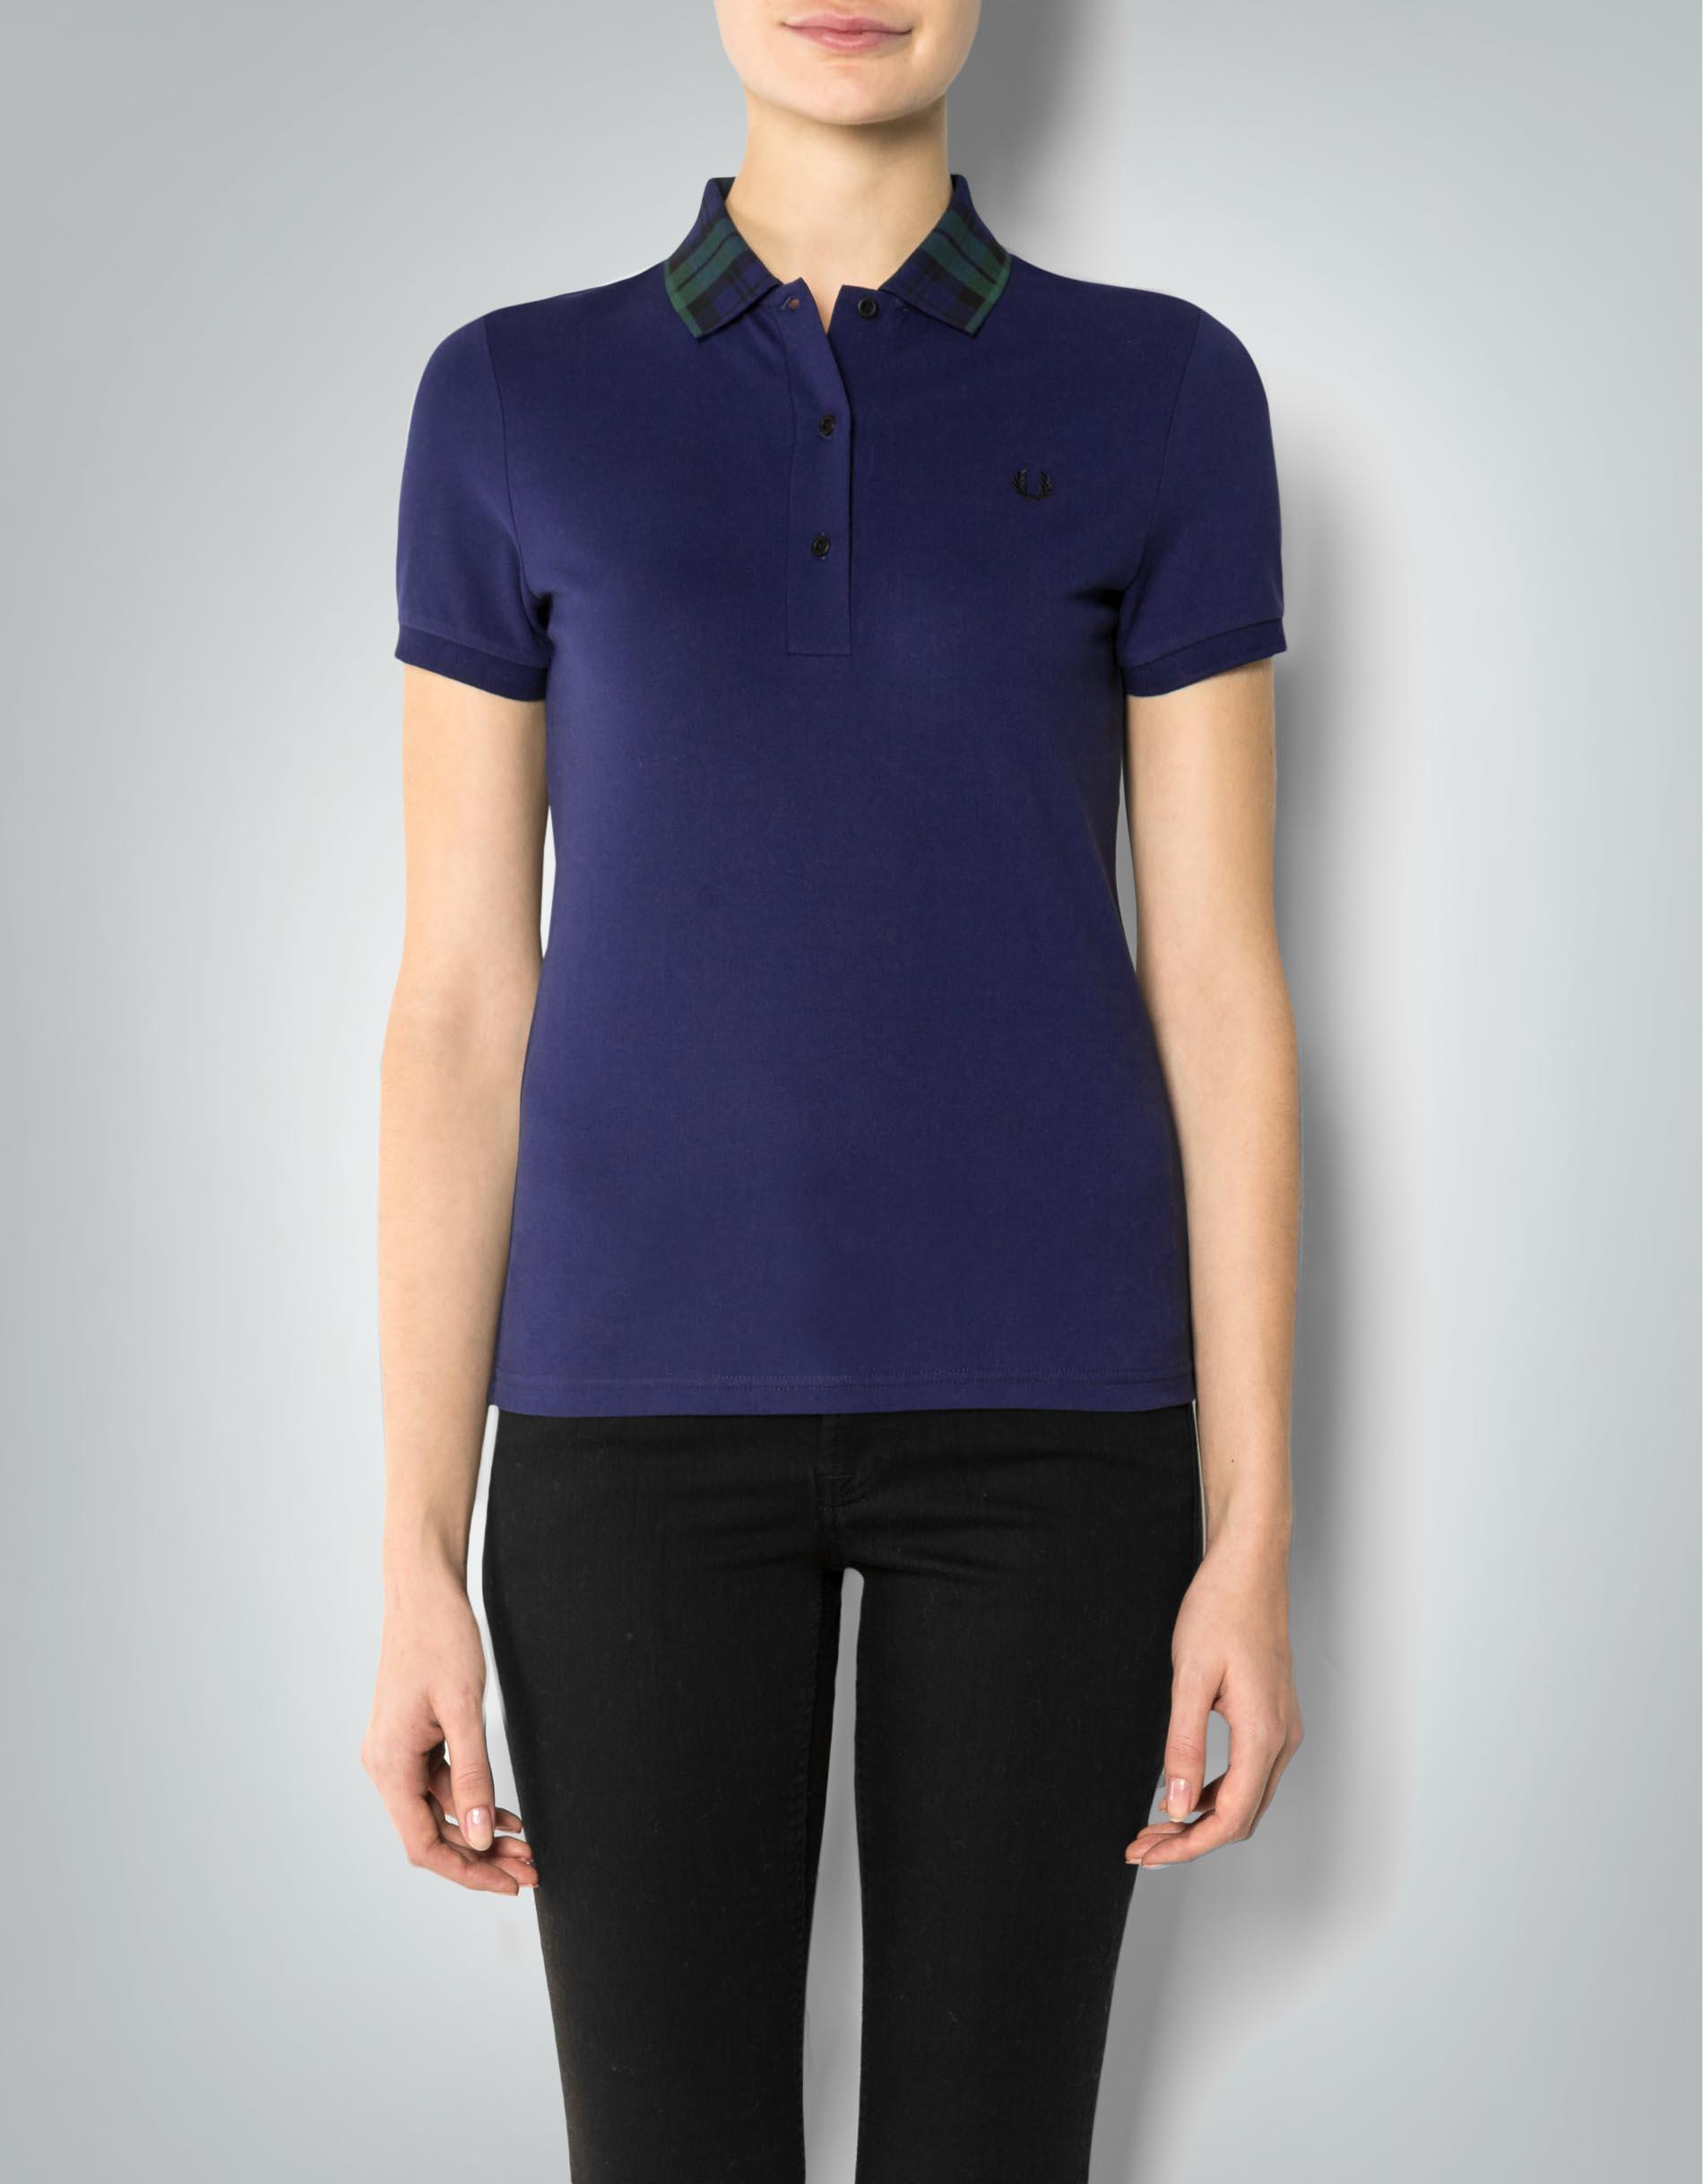 fred perry damen polo shirt mit kontrastkragen empfohlen. Black Bedroom Furniture Sets. Home Design Ideas